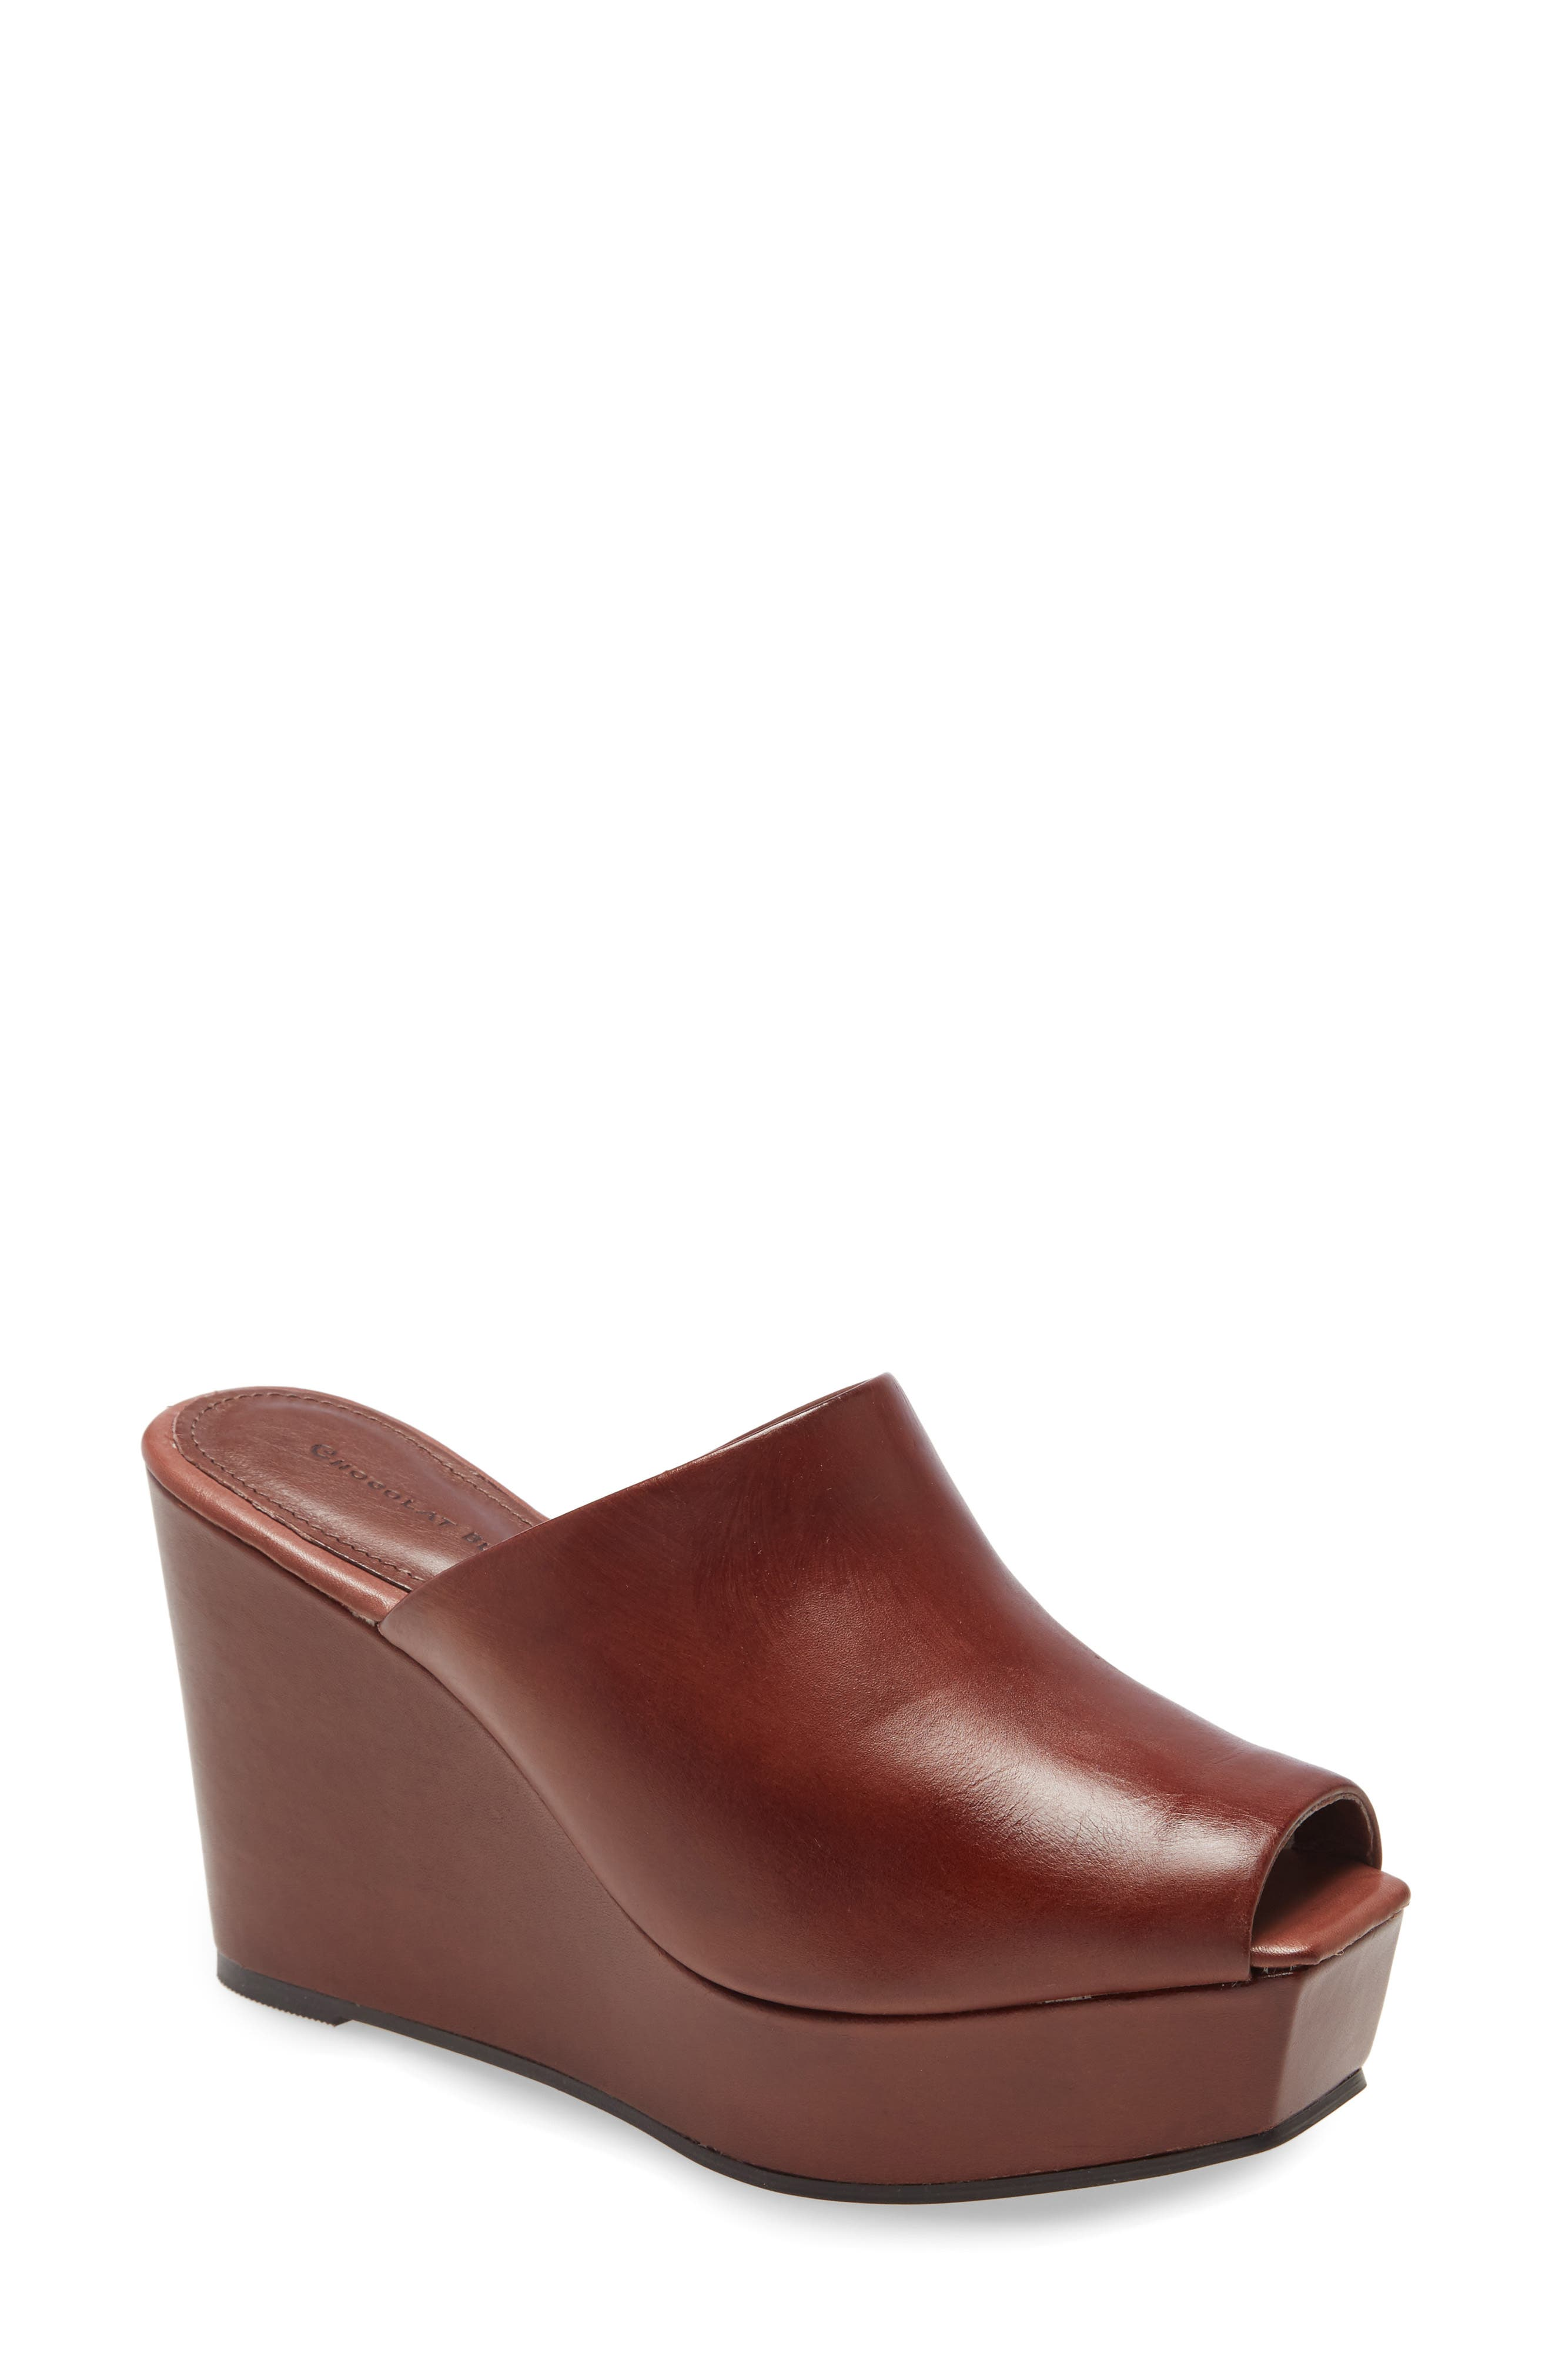 Women's Chocolat Blu Shoes   Nordstrom